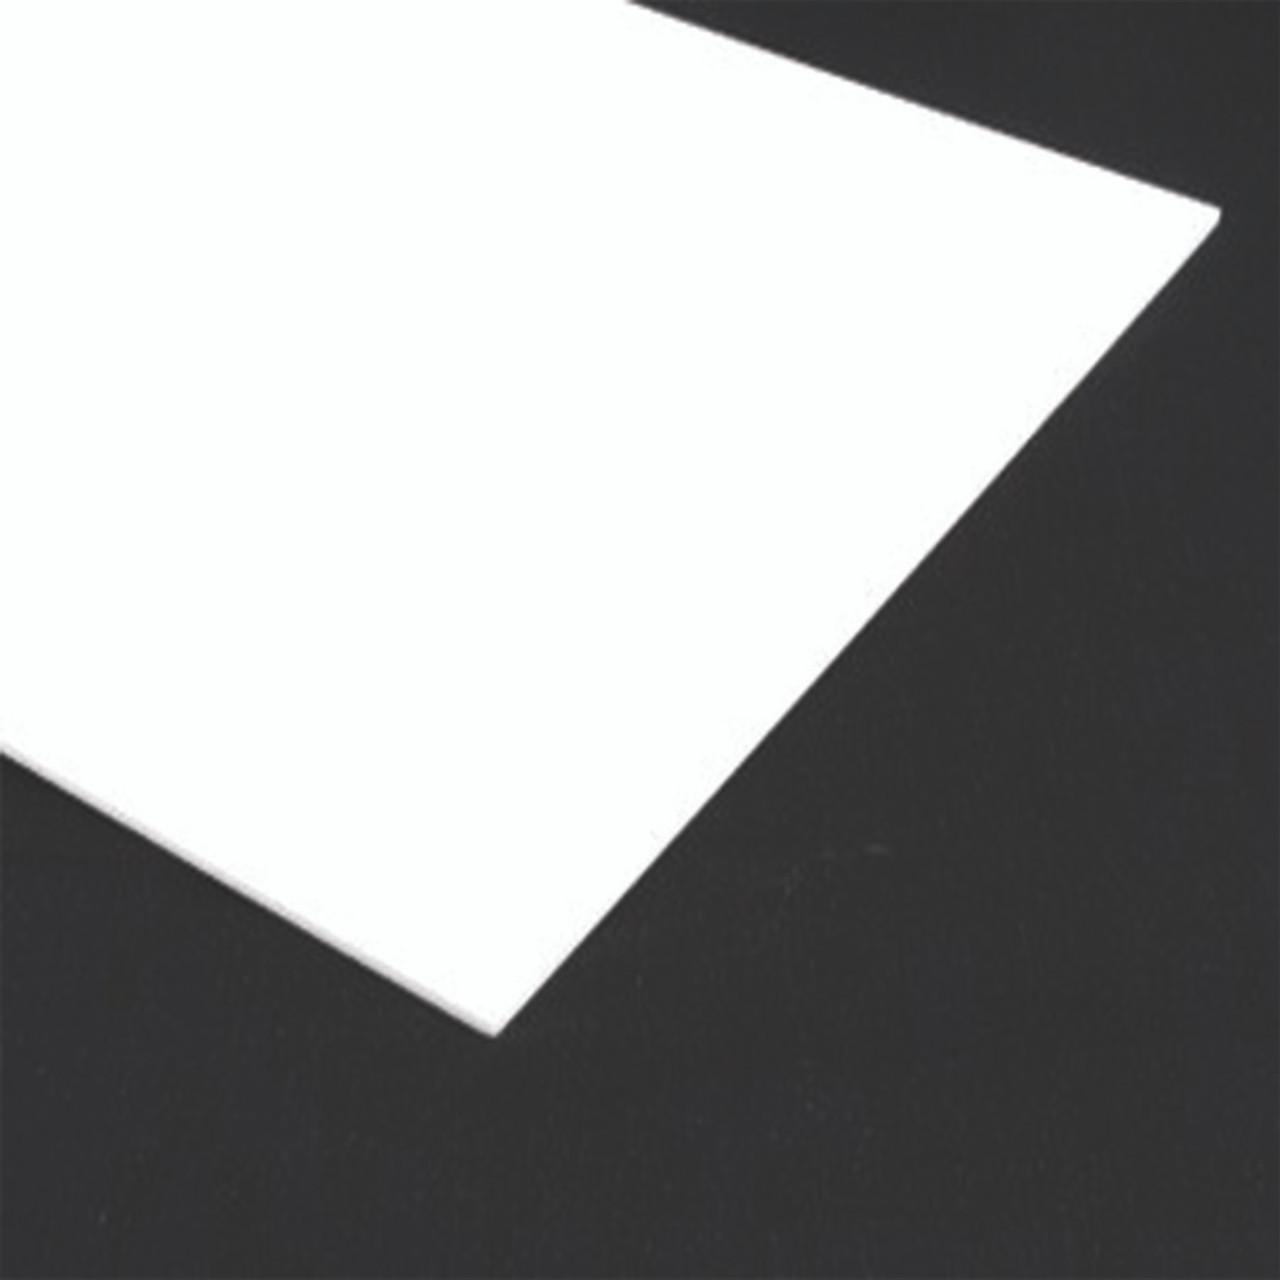 "4' x 8' x 1/8""Opaque White Acrylic Sheet 2 sides Glossy, Plexiglas"